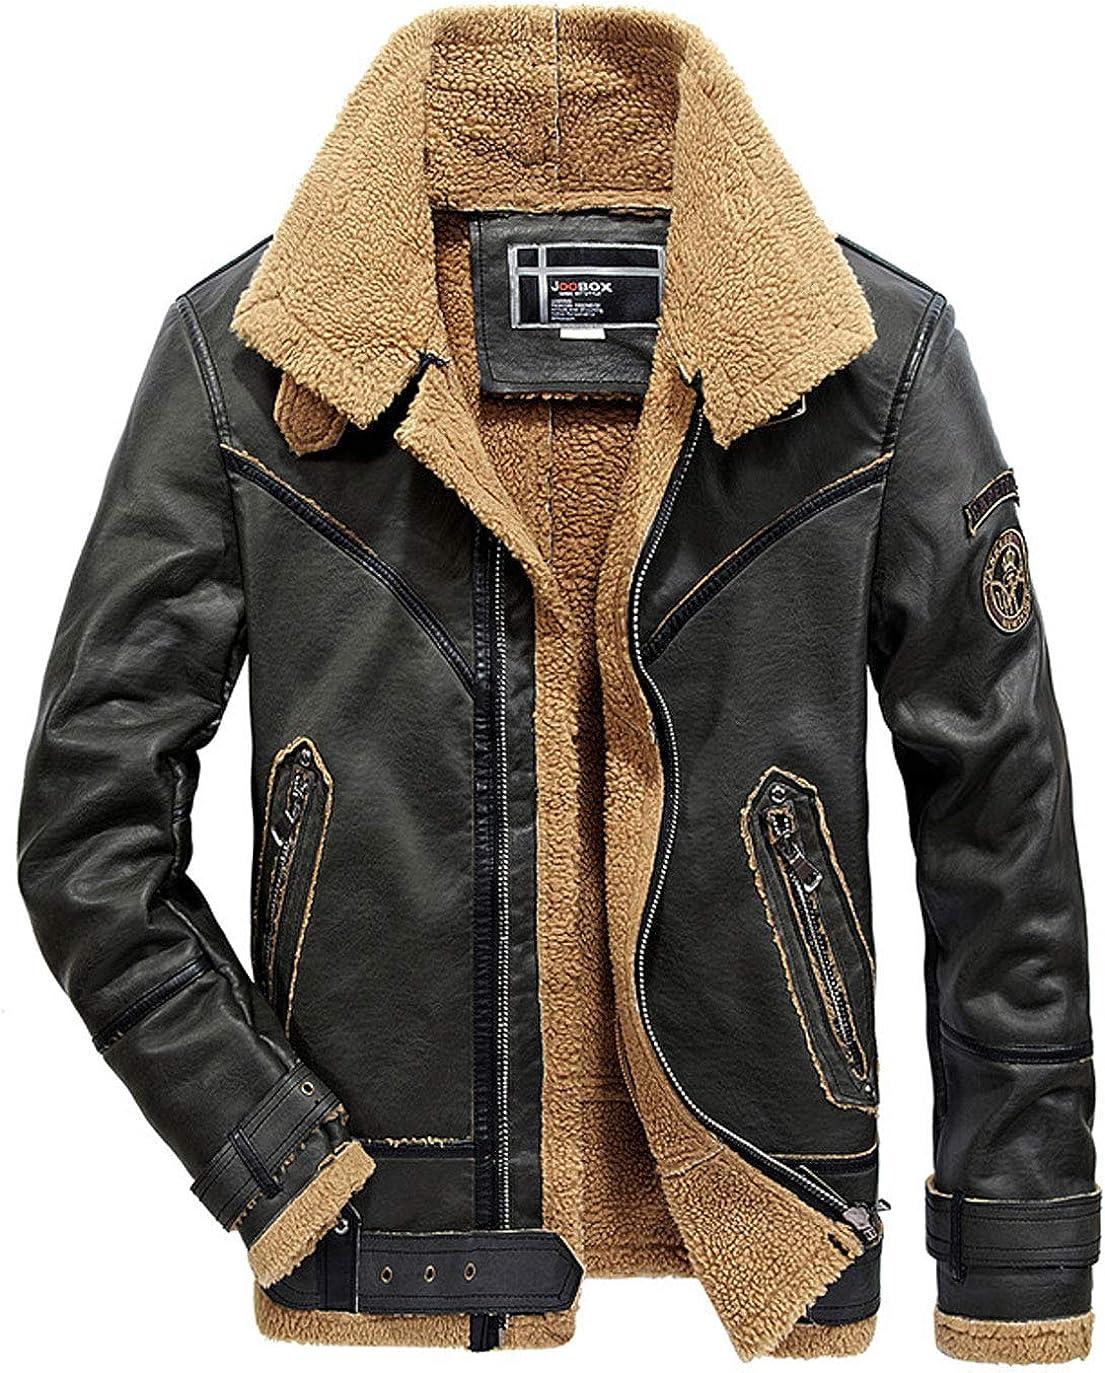 ebossy Men's Zip Up Belted Collar Shearling Faux Leather Biker Jacket